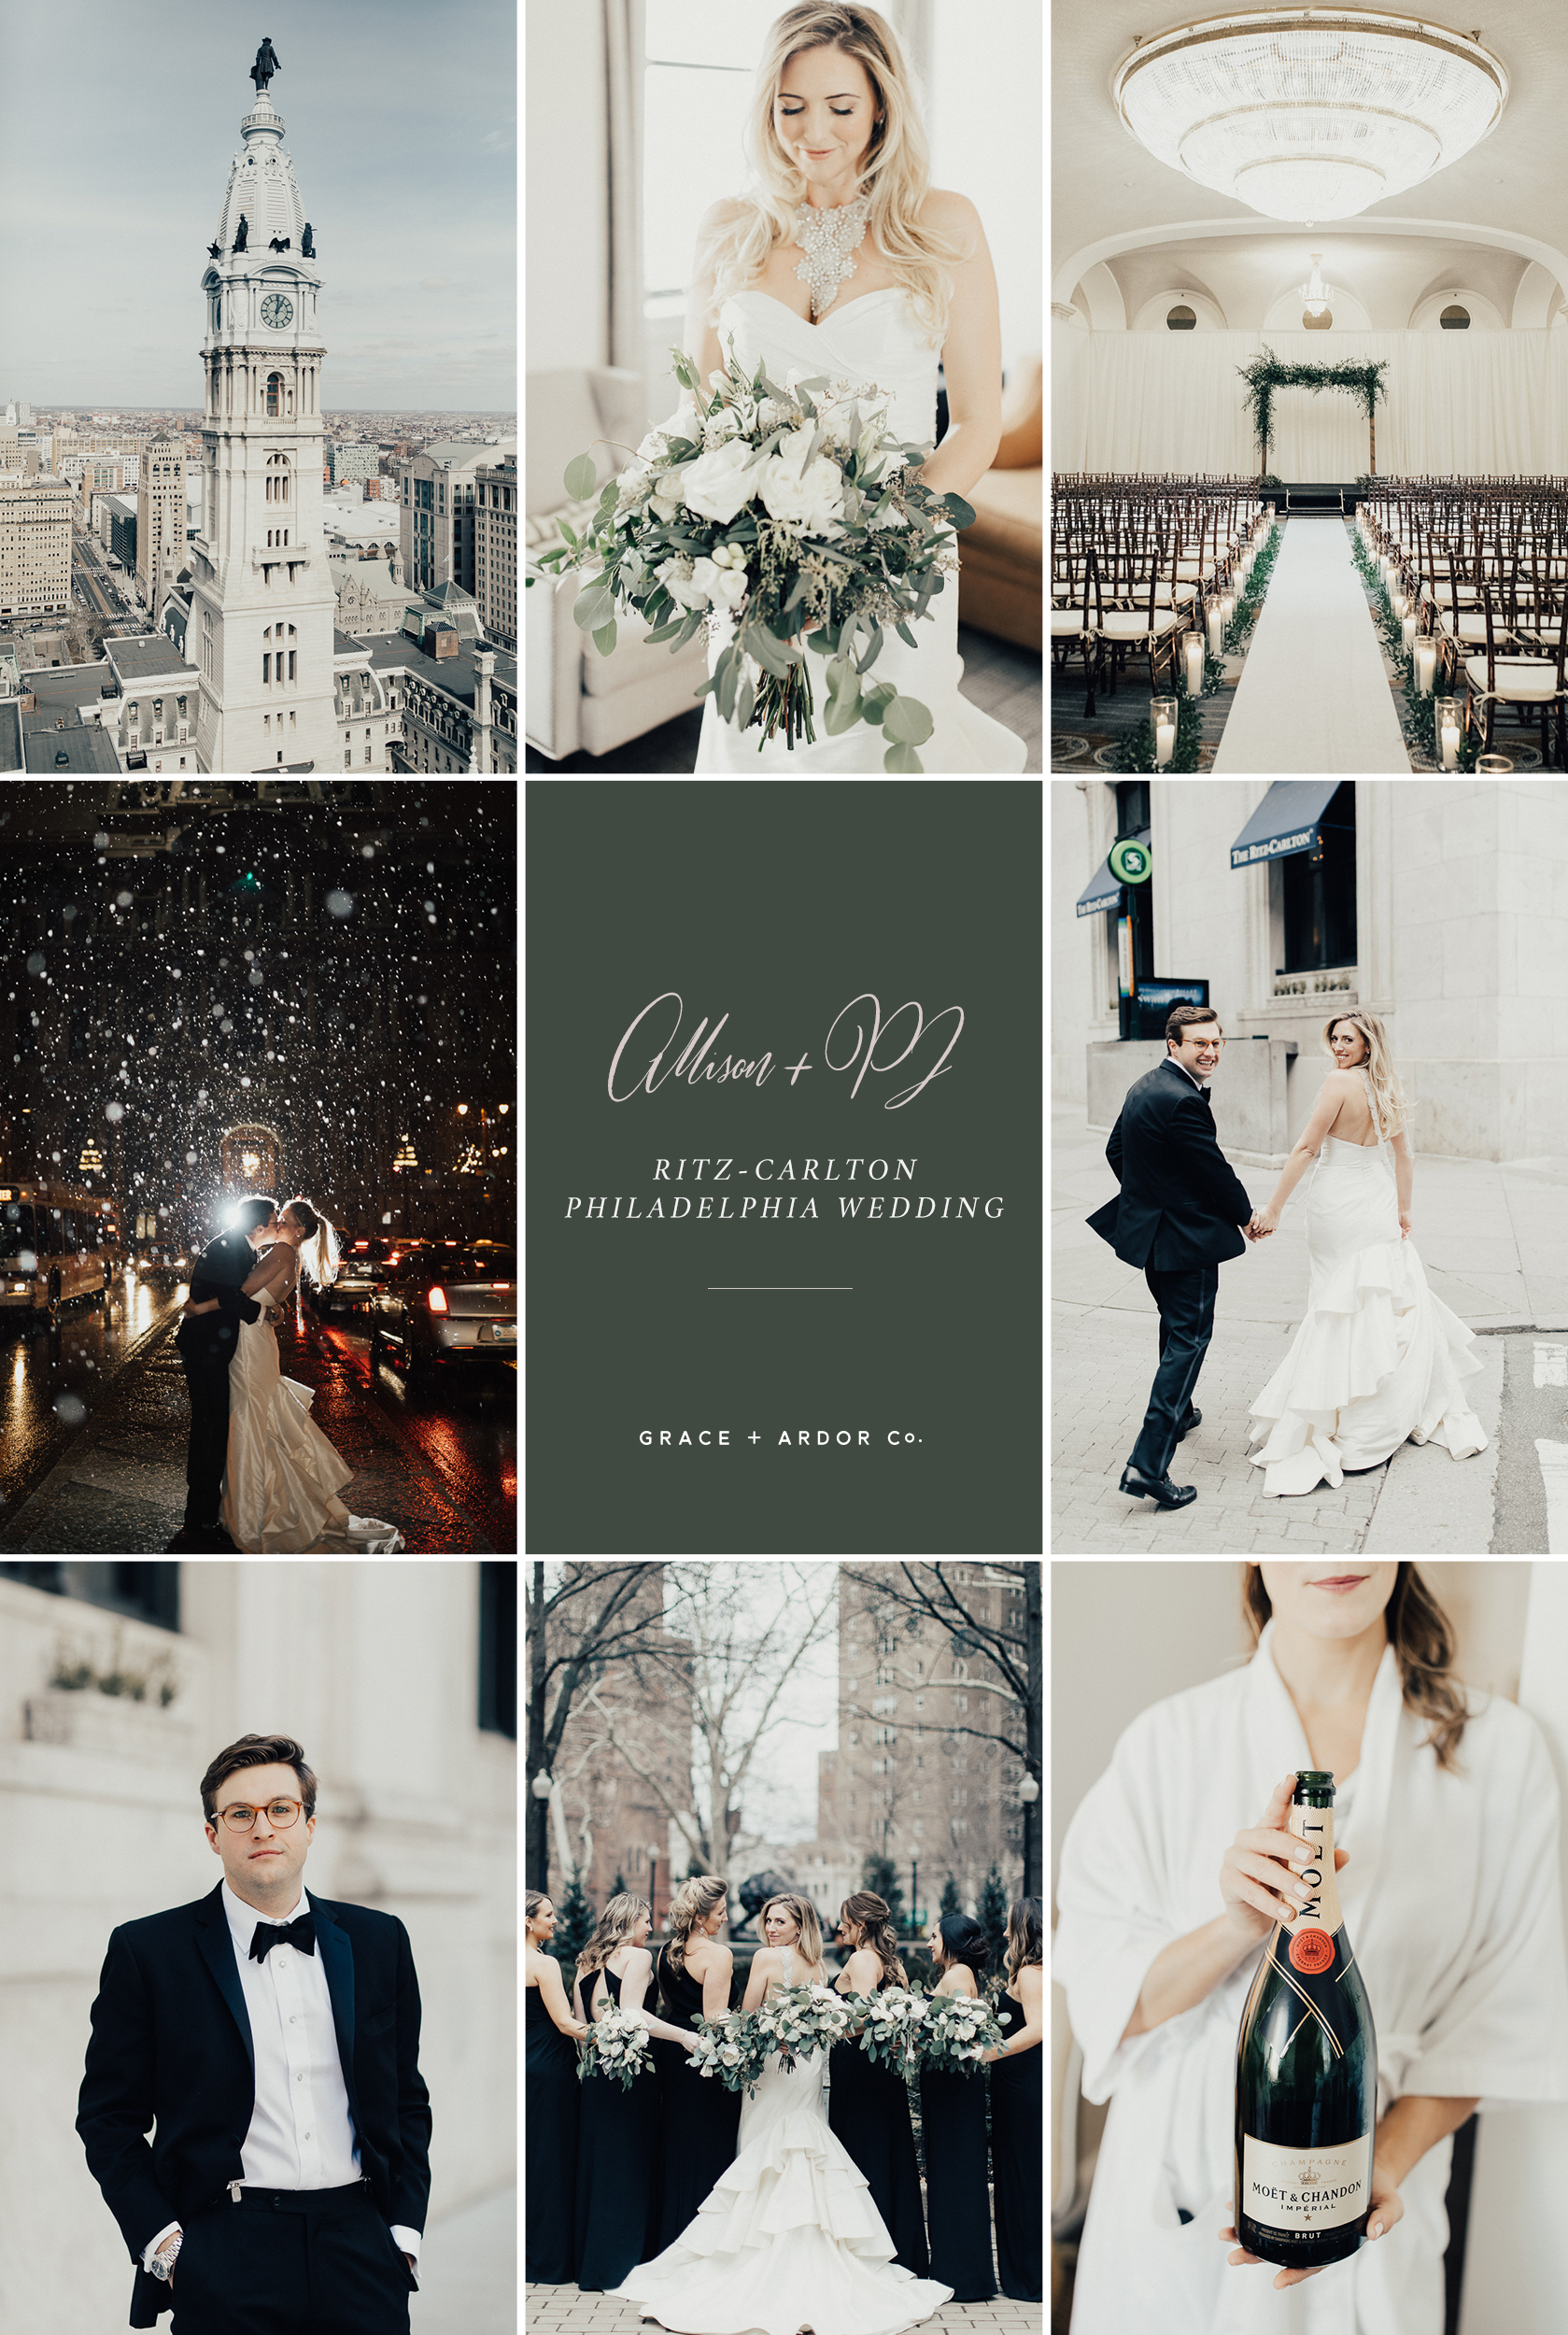 allison-pj-ritz-carlton-philadelphia-wedding-grid.jpg